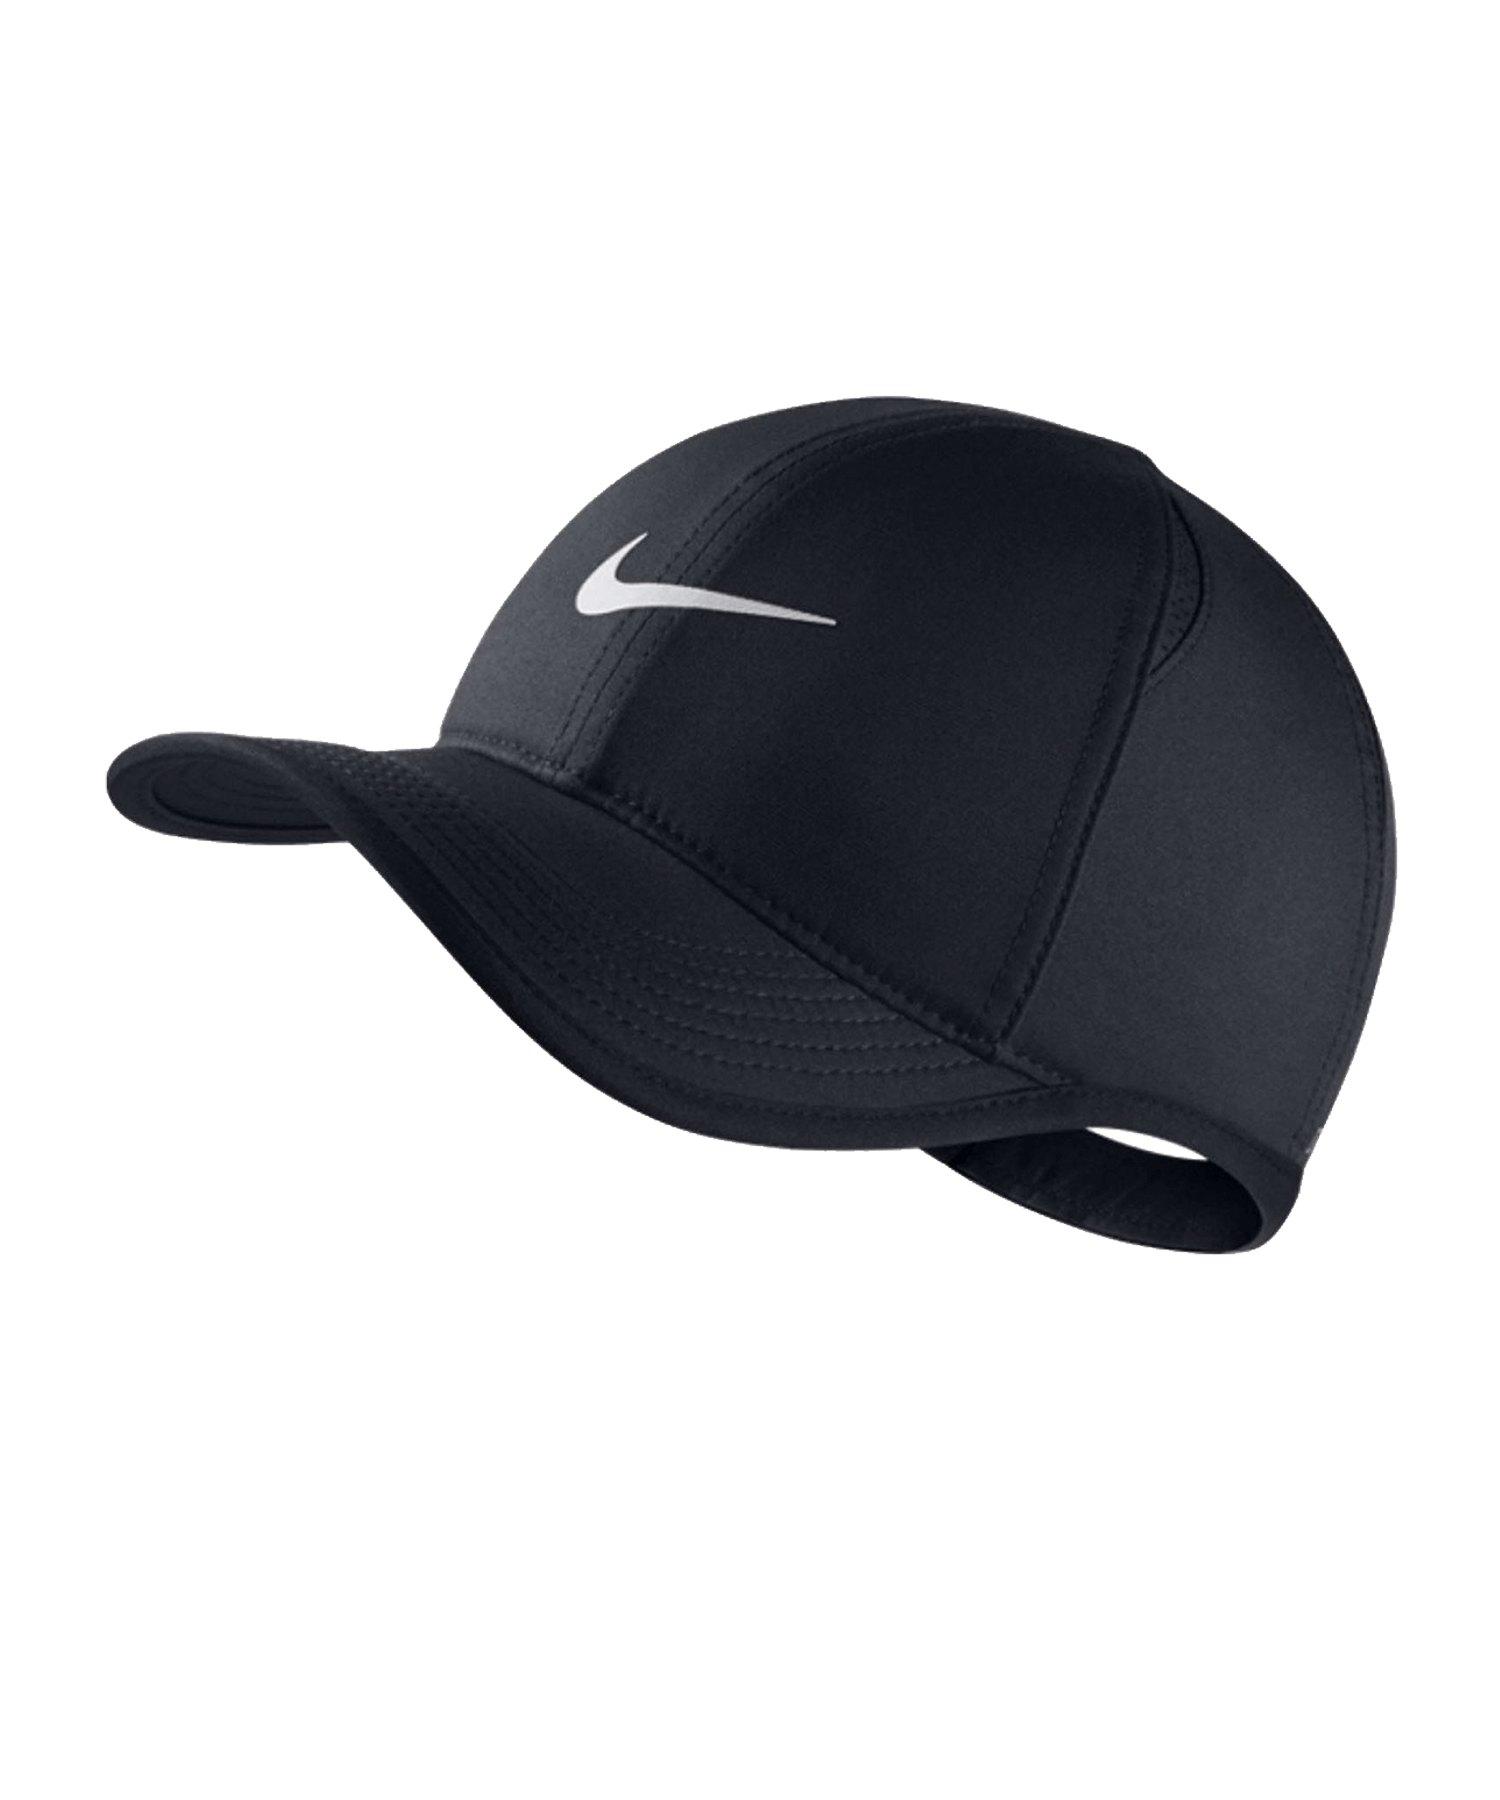 Nike Aerobill Featherlight Cap Kids Schwarz F010 - schwarz